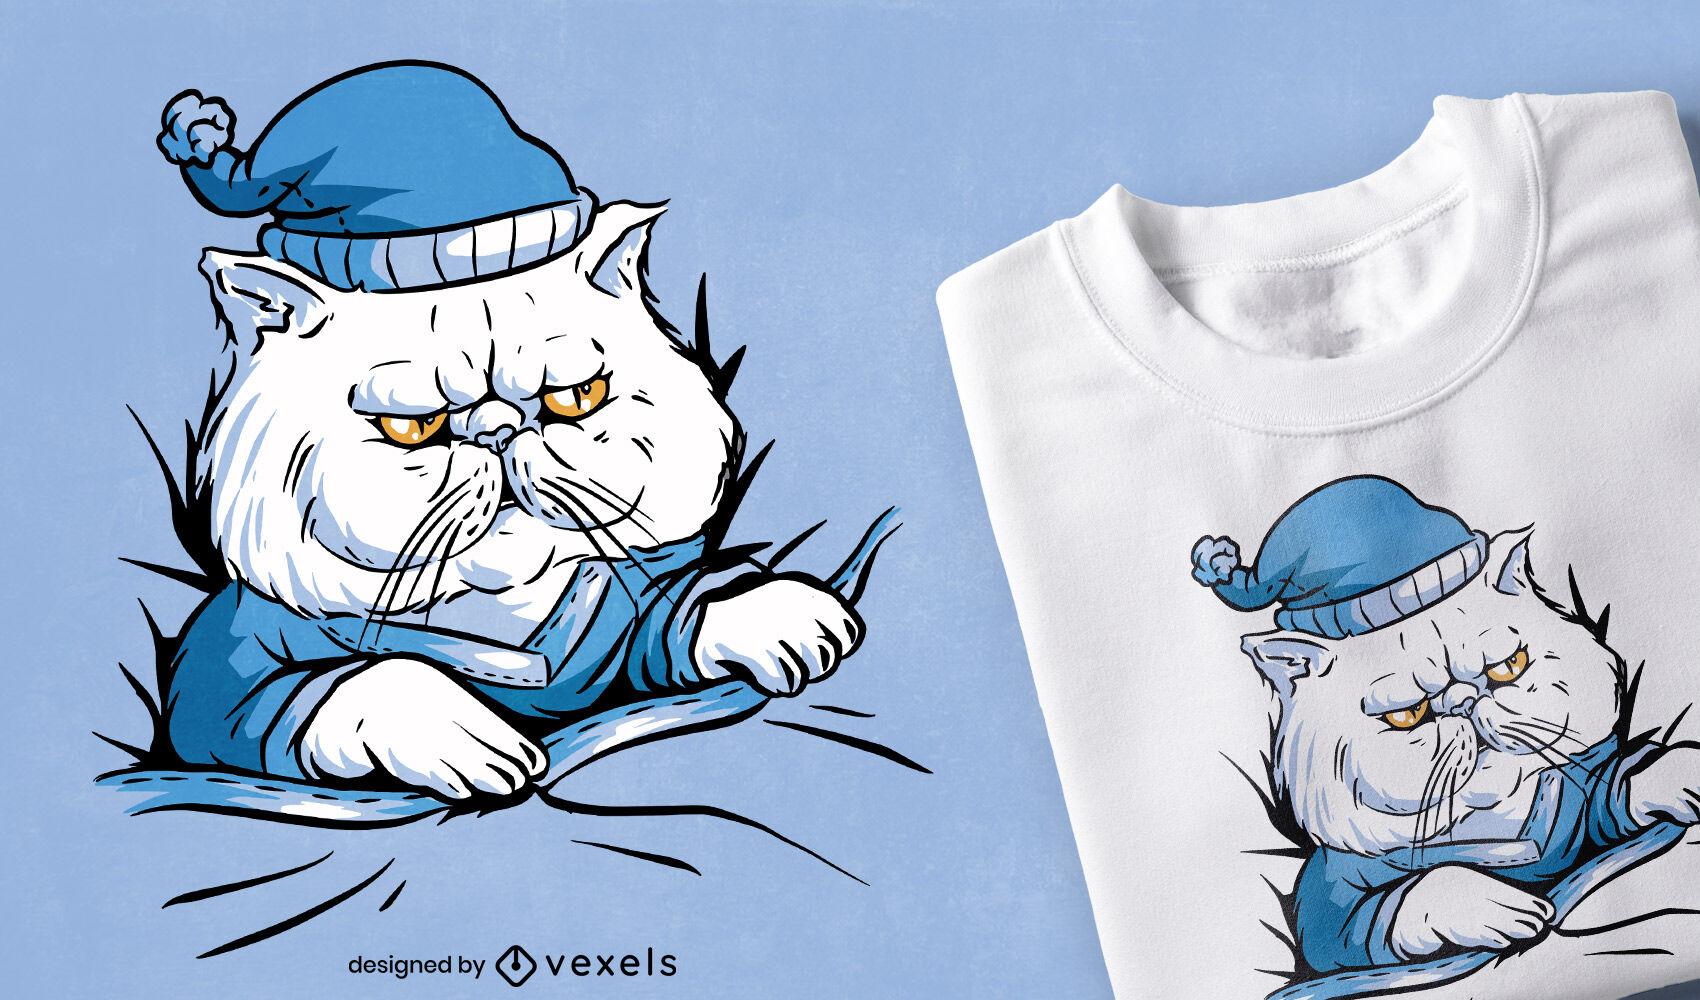 Animal gato sonolento com design de camiseta de pijama